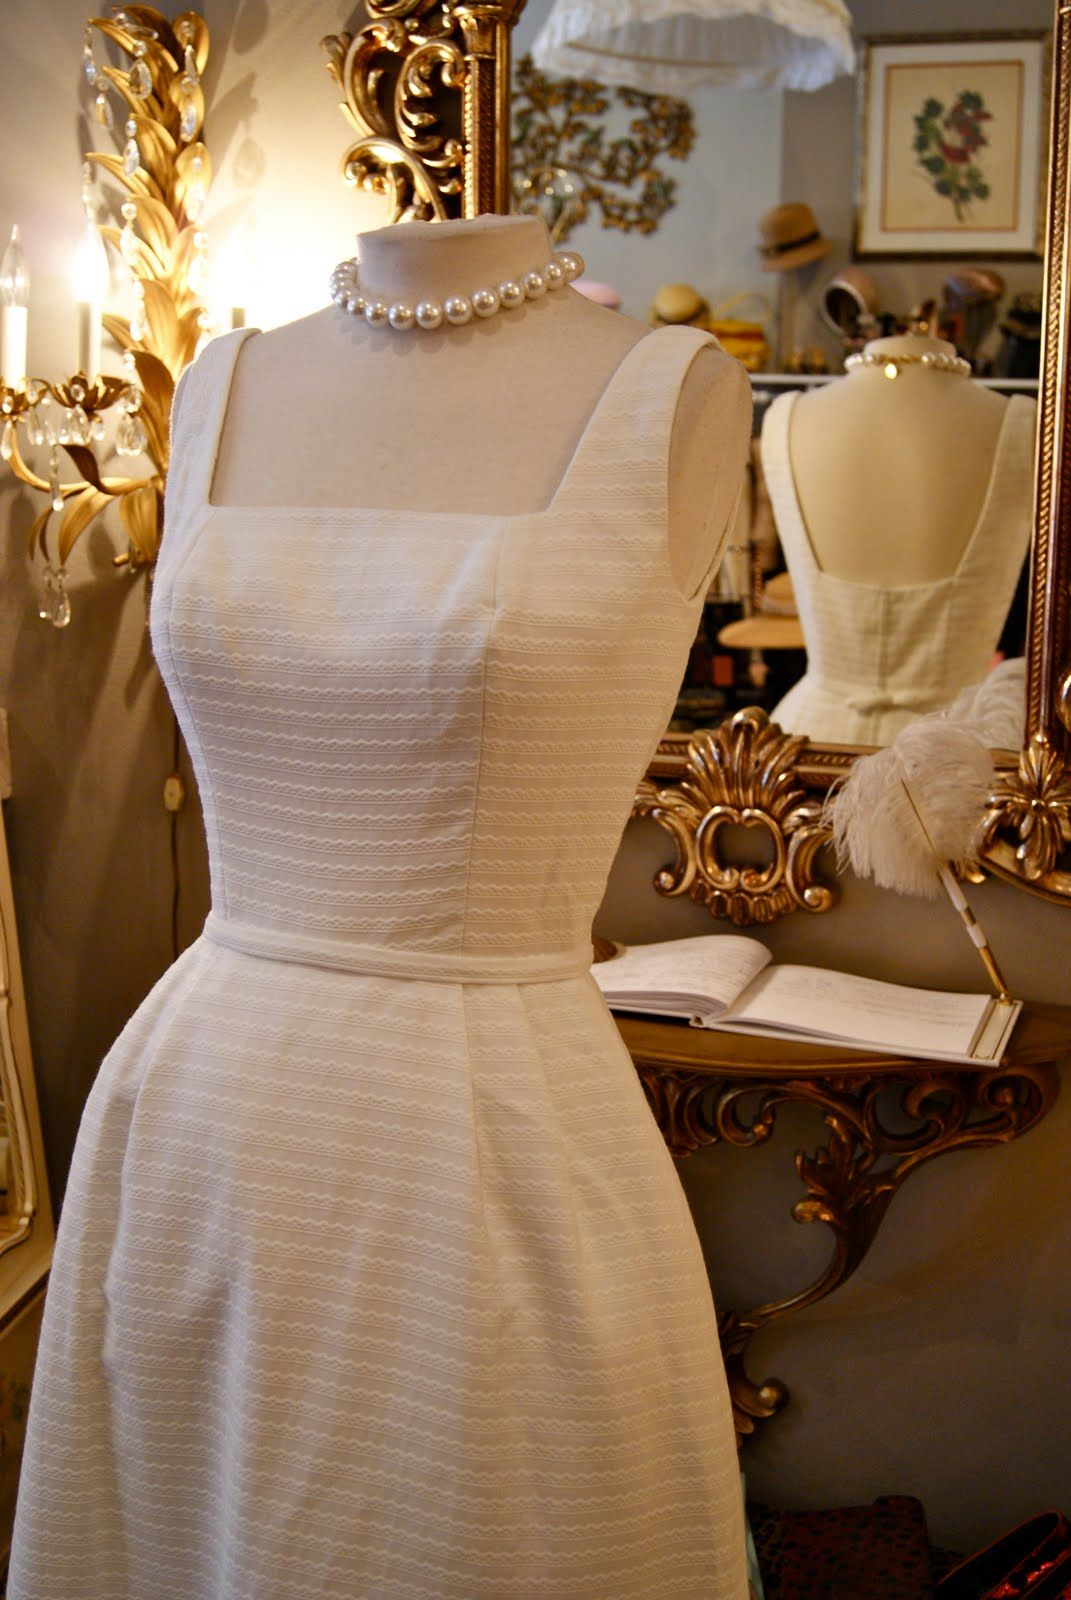 Xtabay Vintage Clothing Boutique - Portland, Oregon Also love the ...